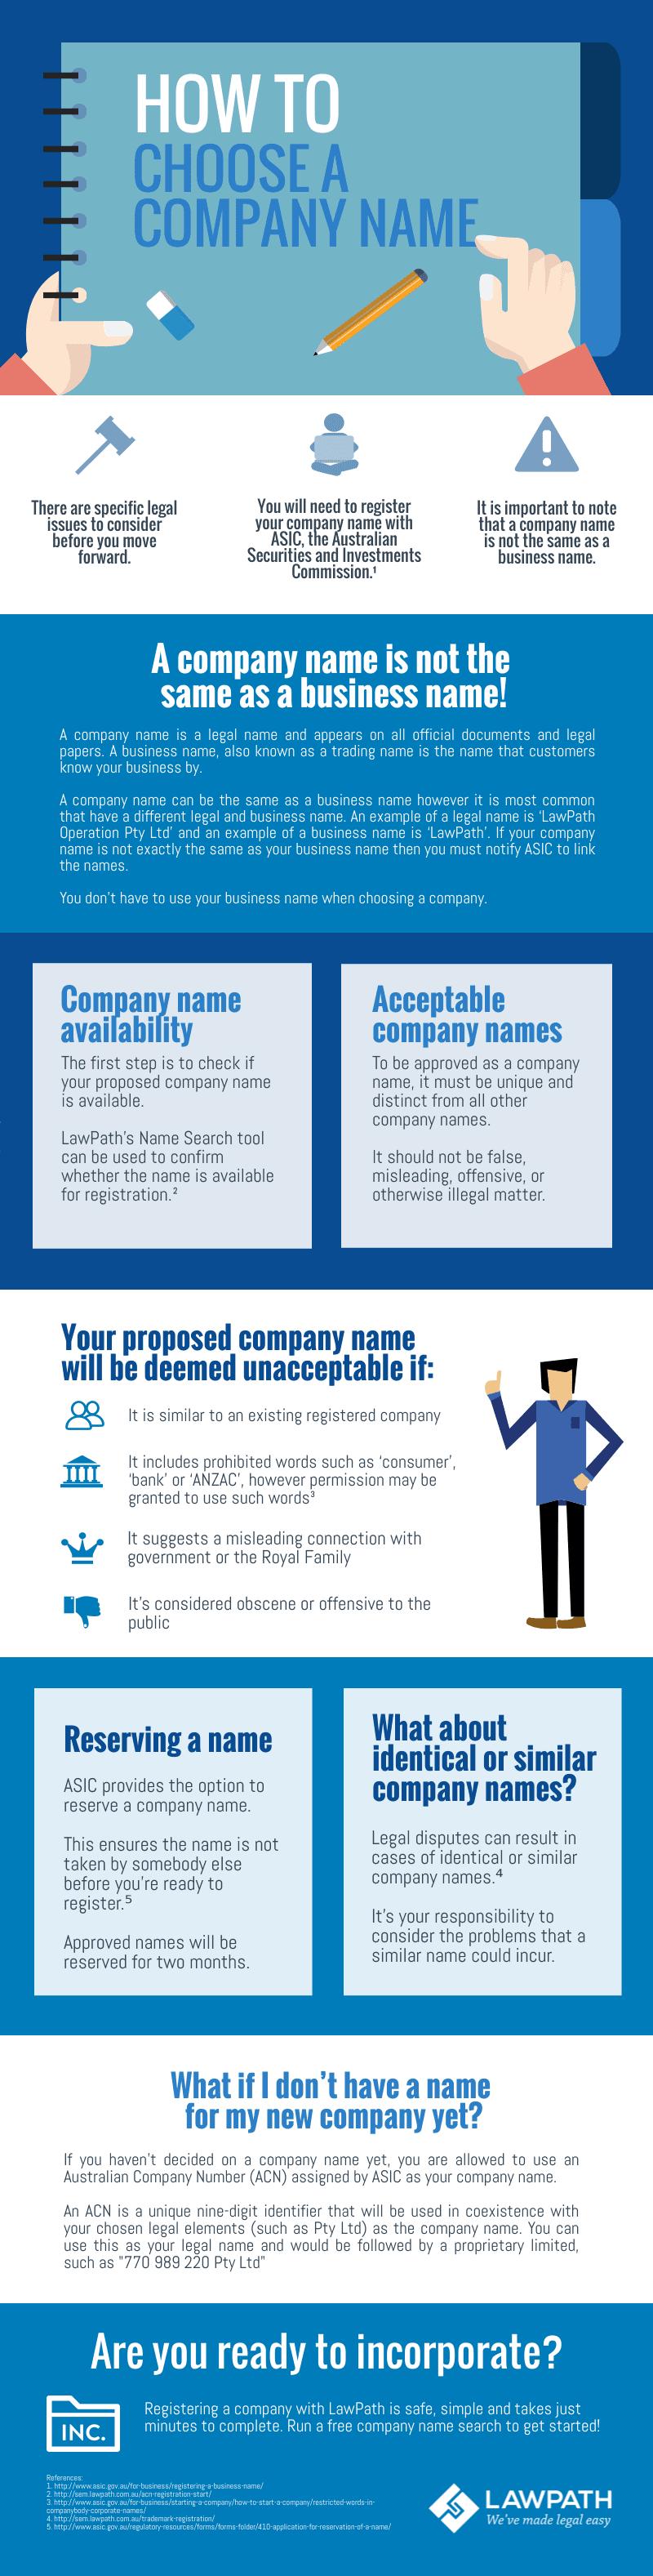 choose company name infographic